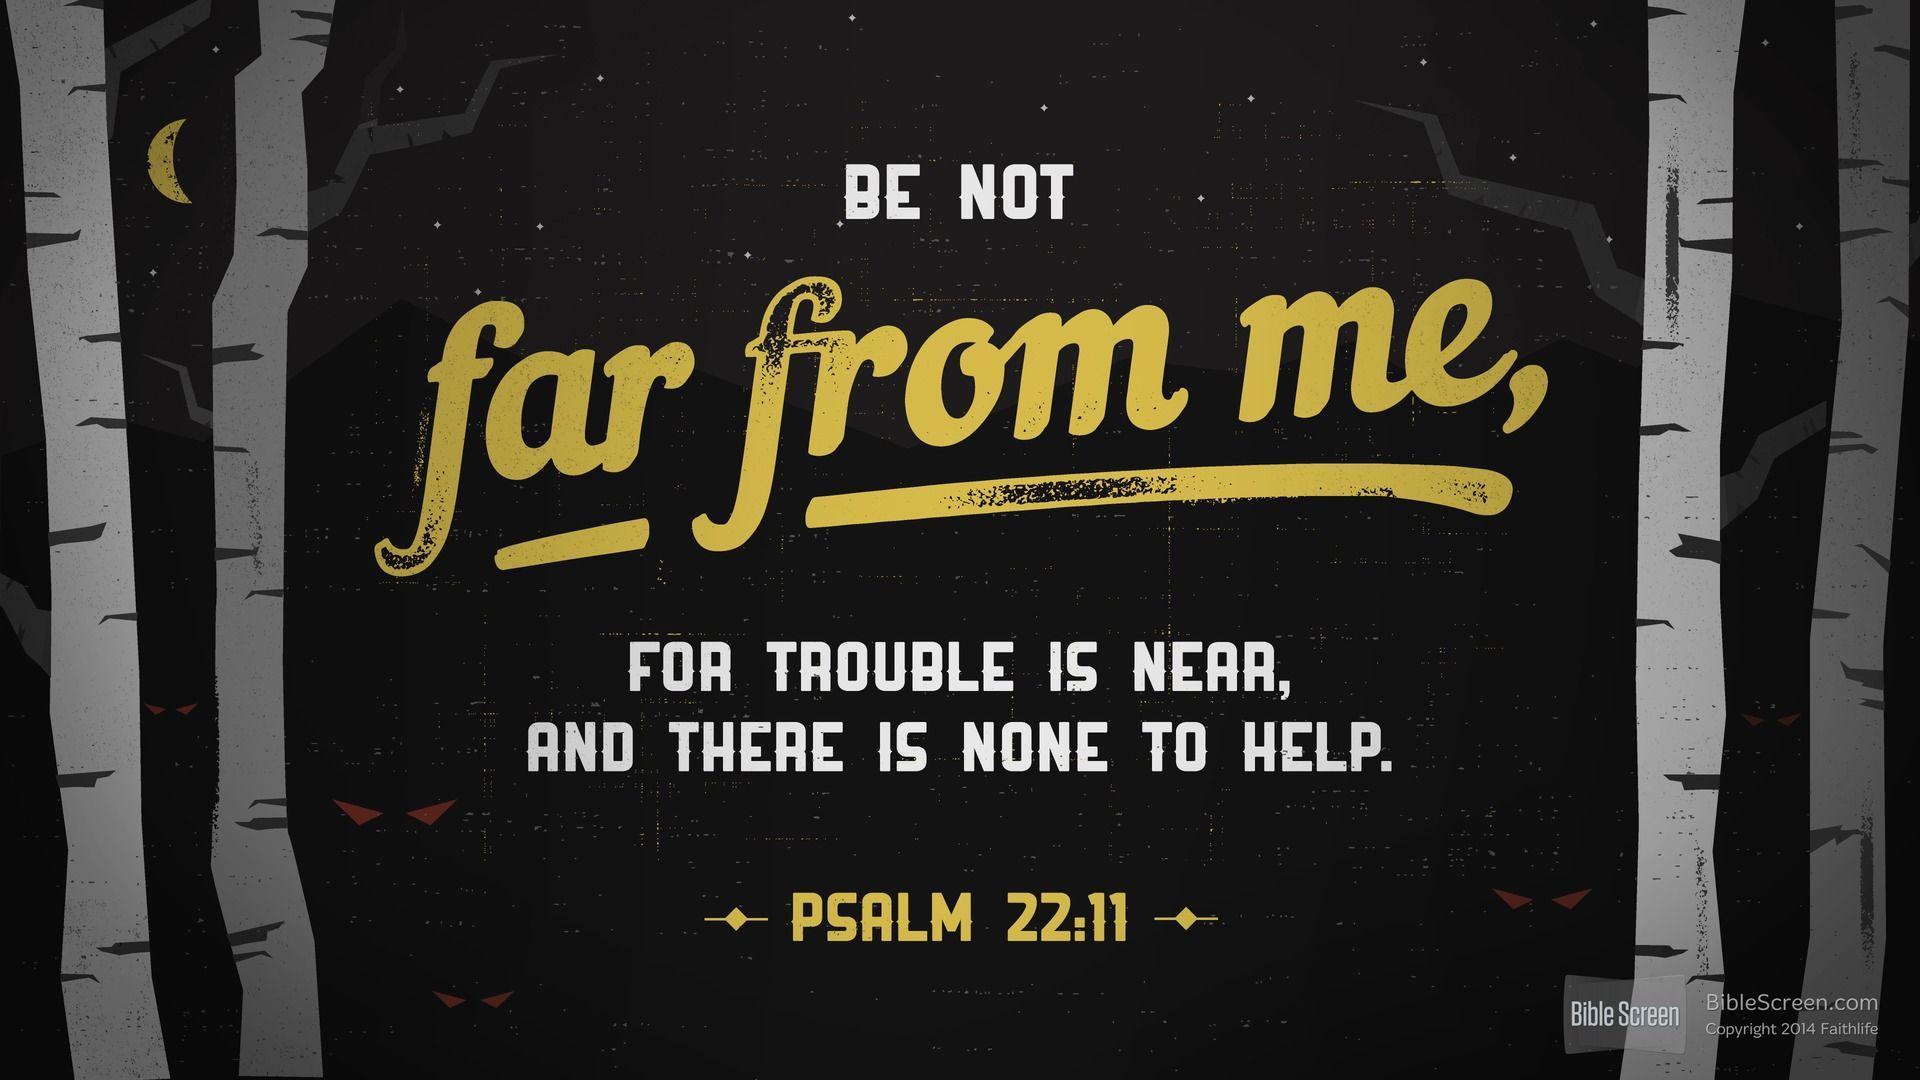 Psalm 22:11 (ESV) - Biblia.com | Psalm 22, Psalms, Scripture verses